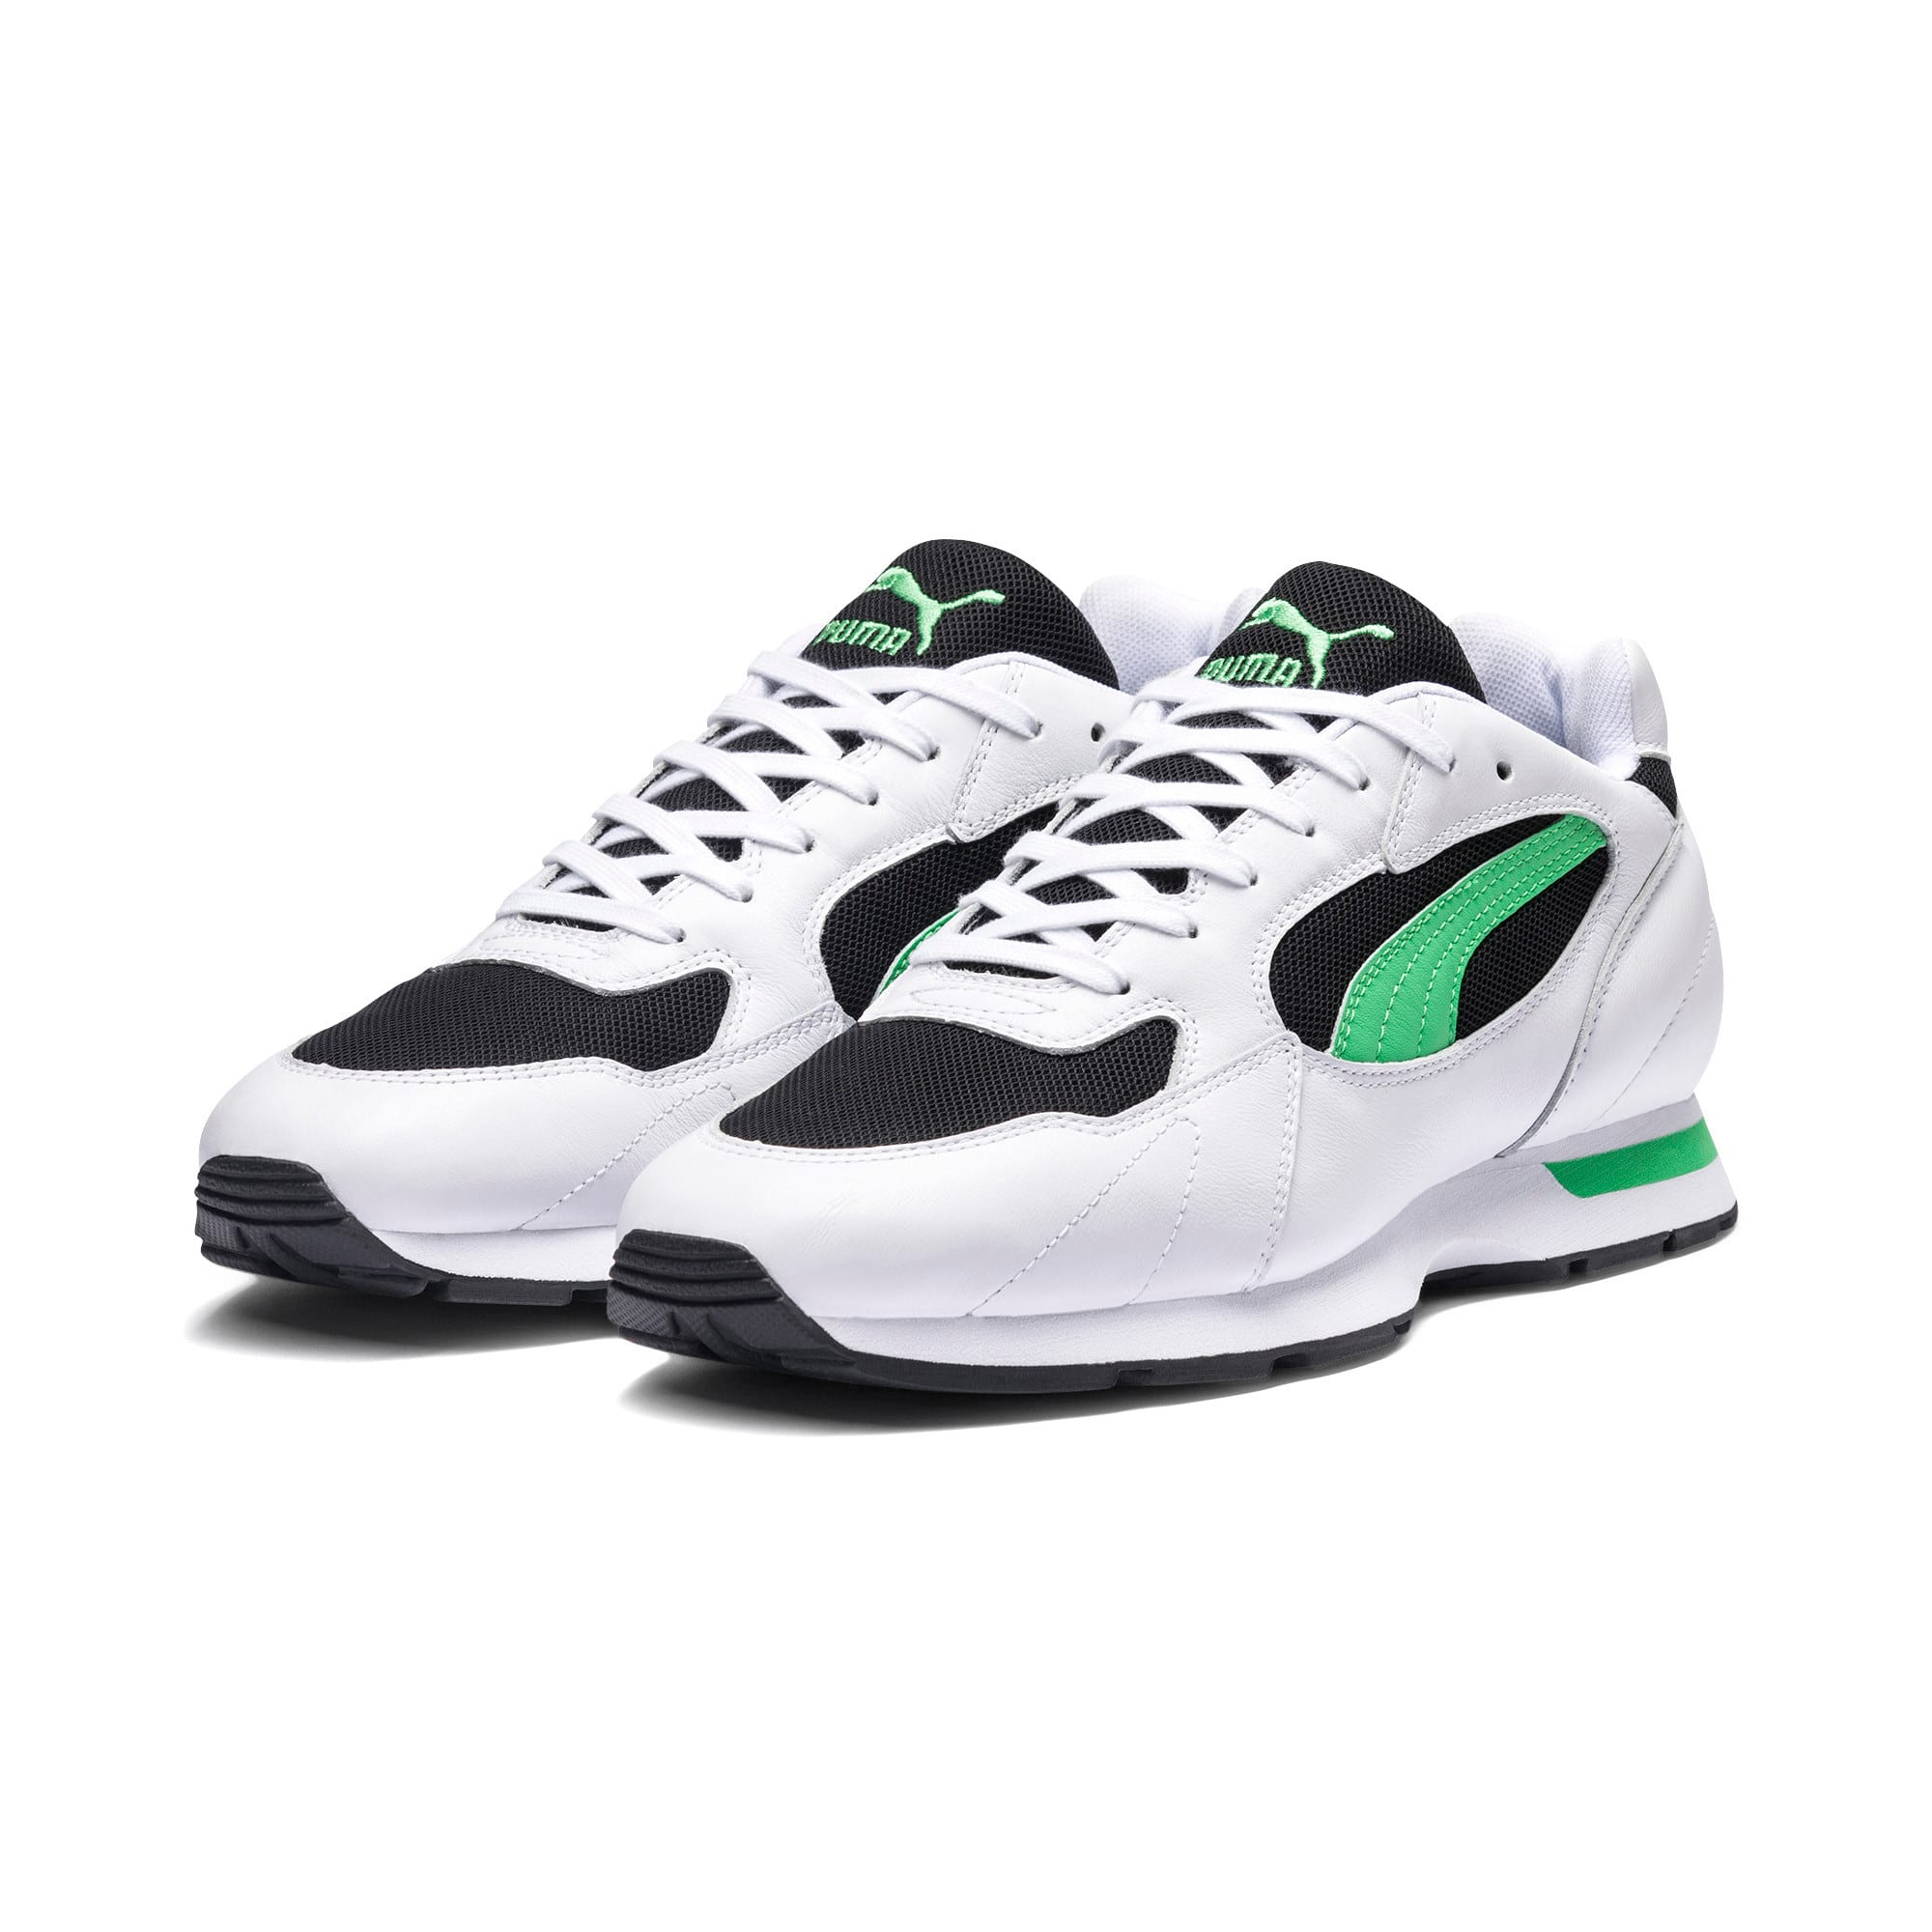 Thumbnail 2 of Proclaim Men's Sneakers, Puma White-Irish Green, medium